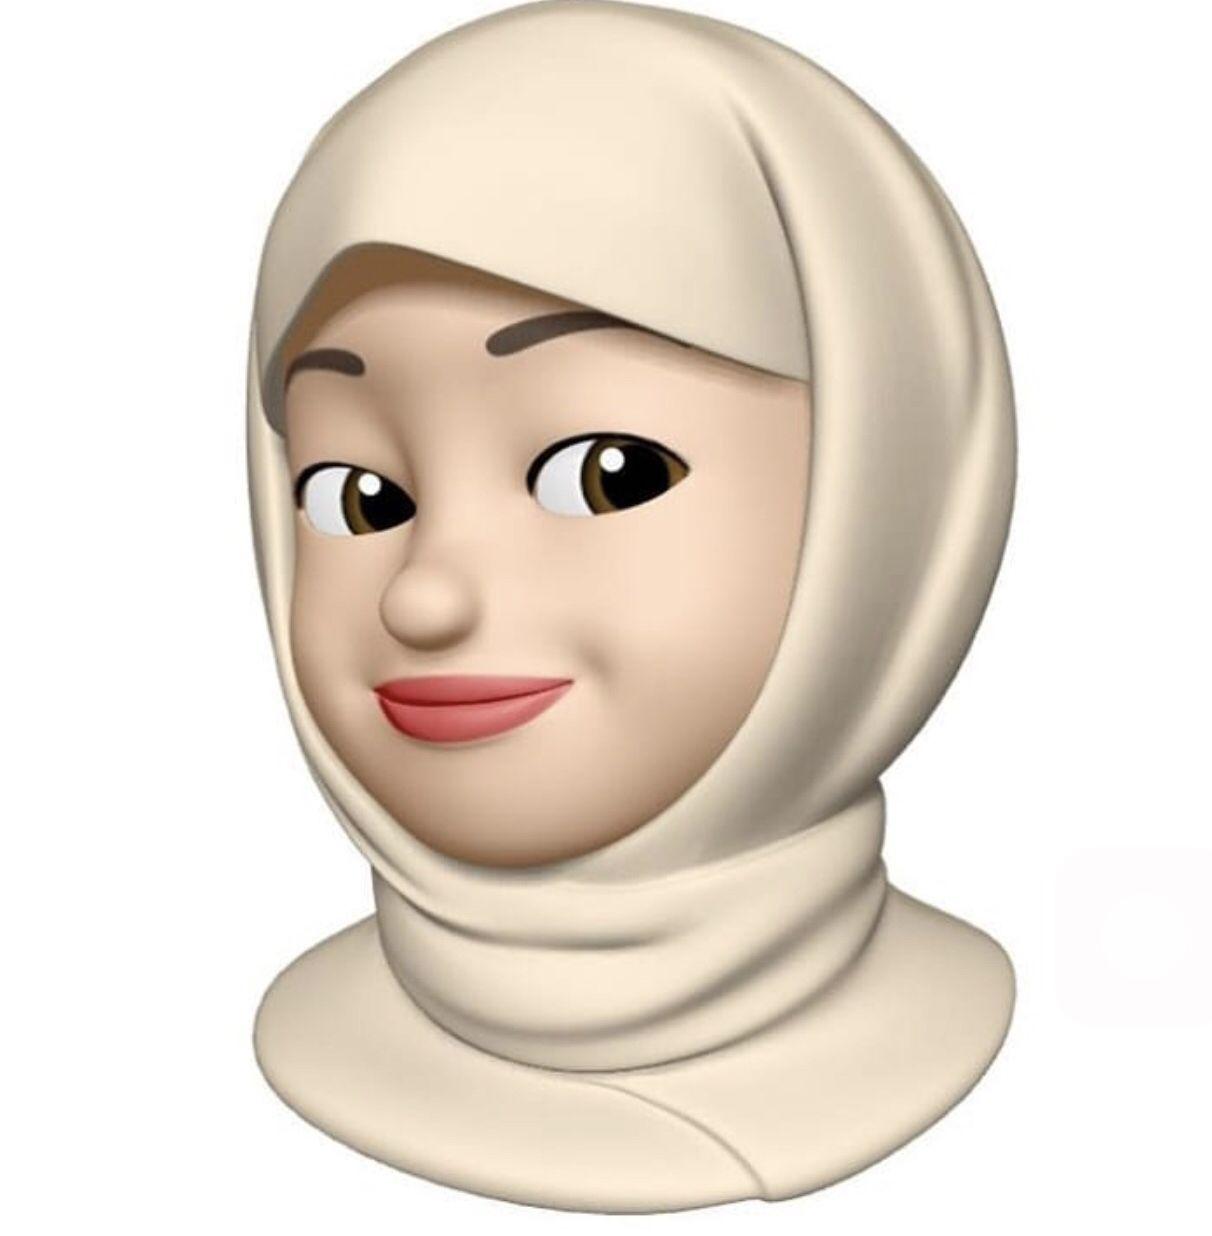 Pin Oleh Habibah Yusoff17 Di Emodji Animasi Desain Karakter Ilustrasi Karakter Gambar Teman